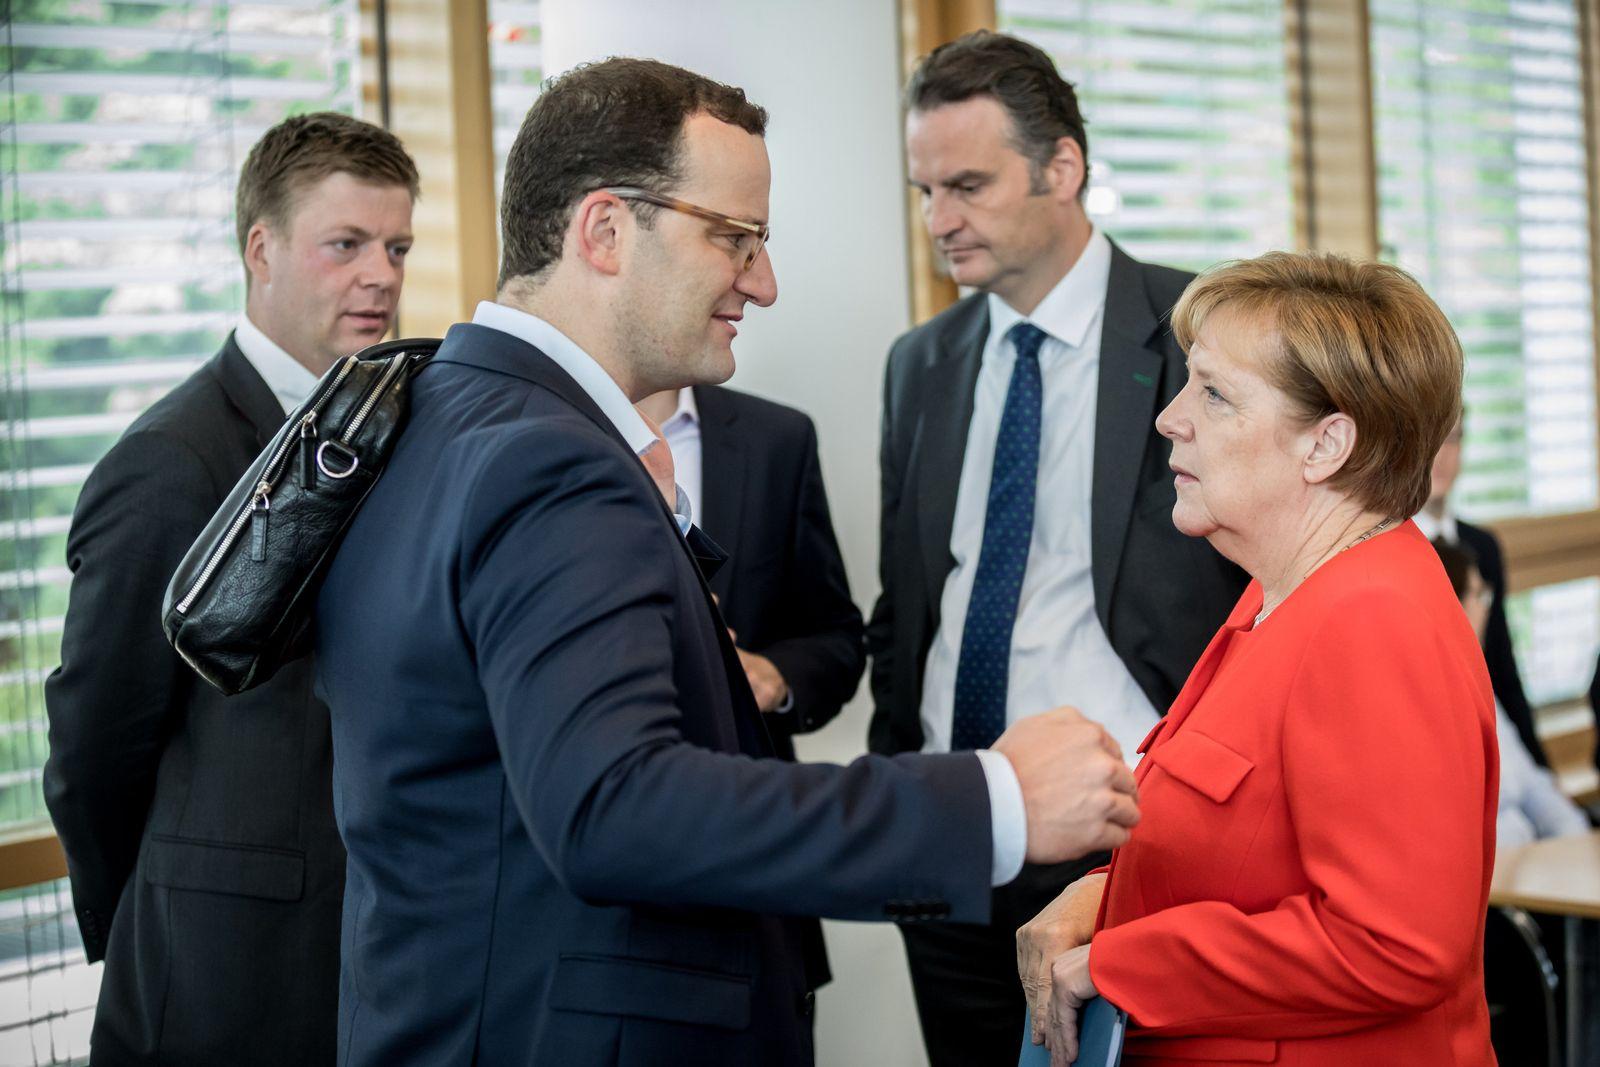 Angela Merkel / Jens Spahn